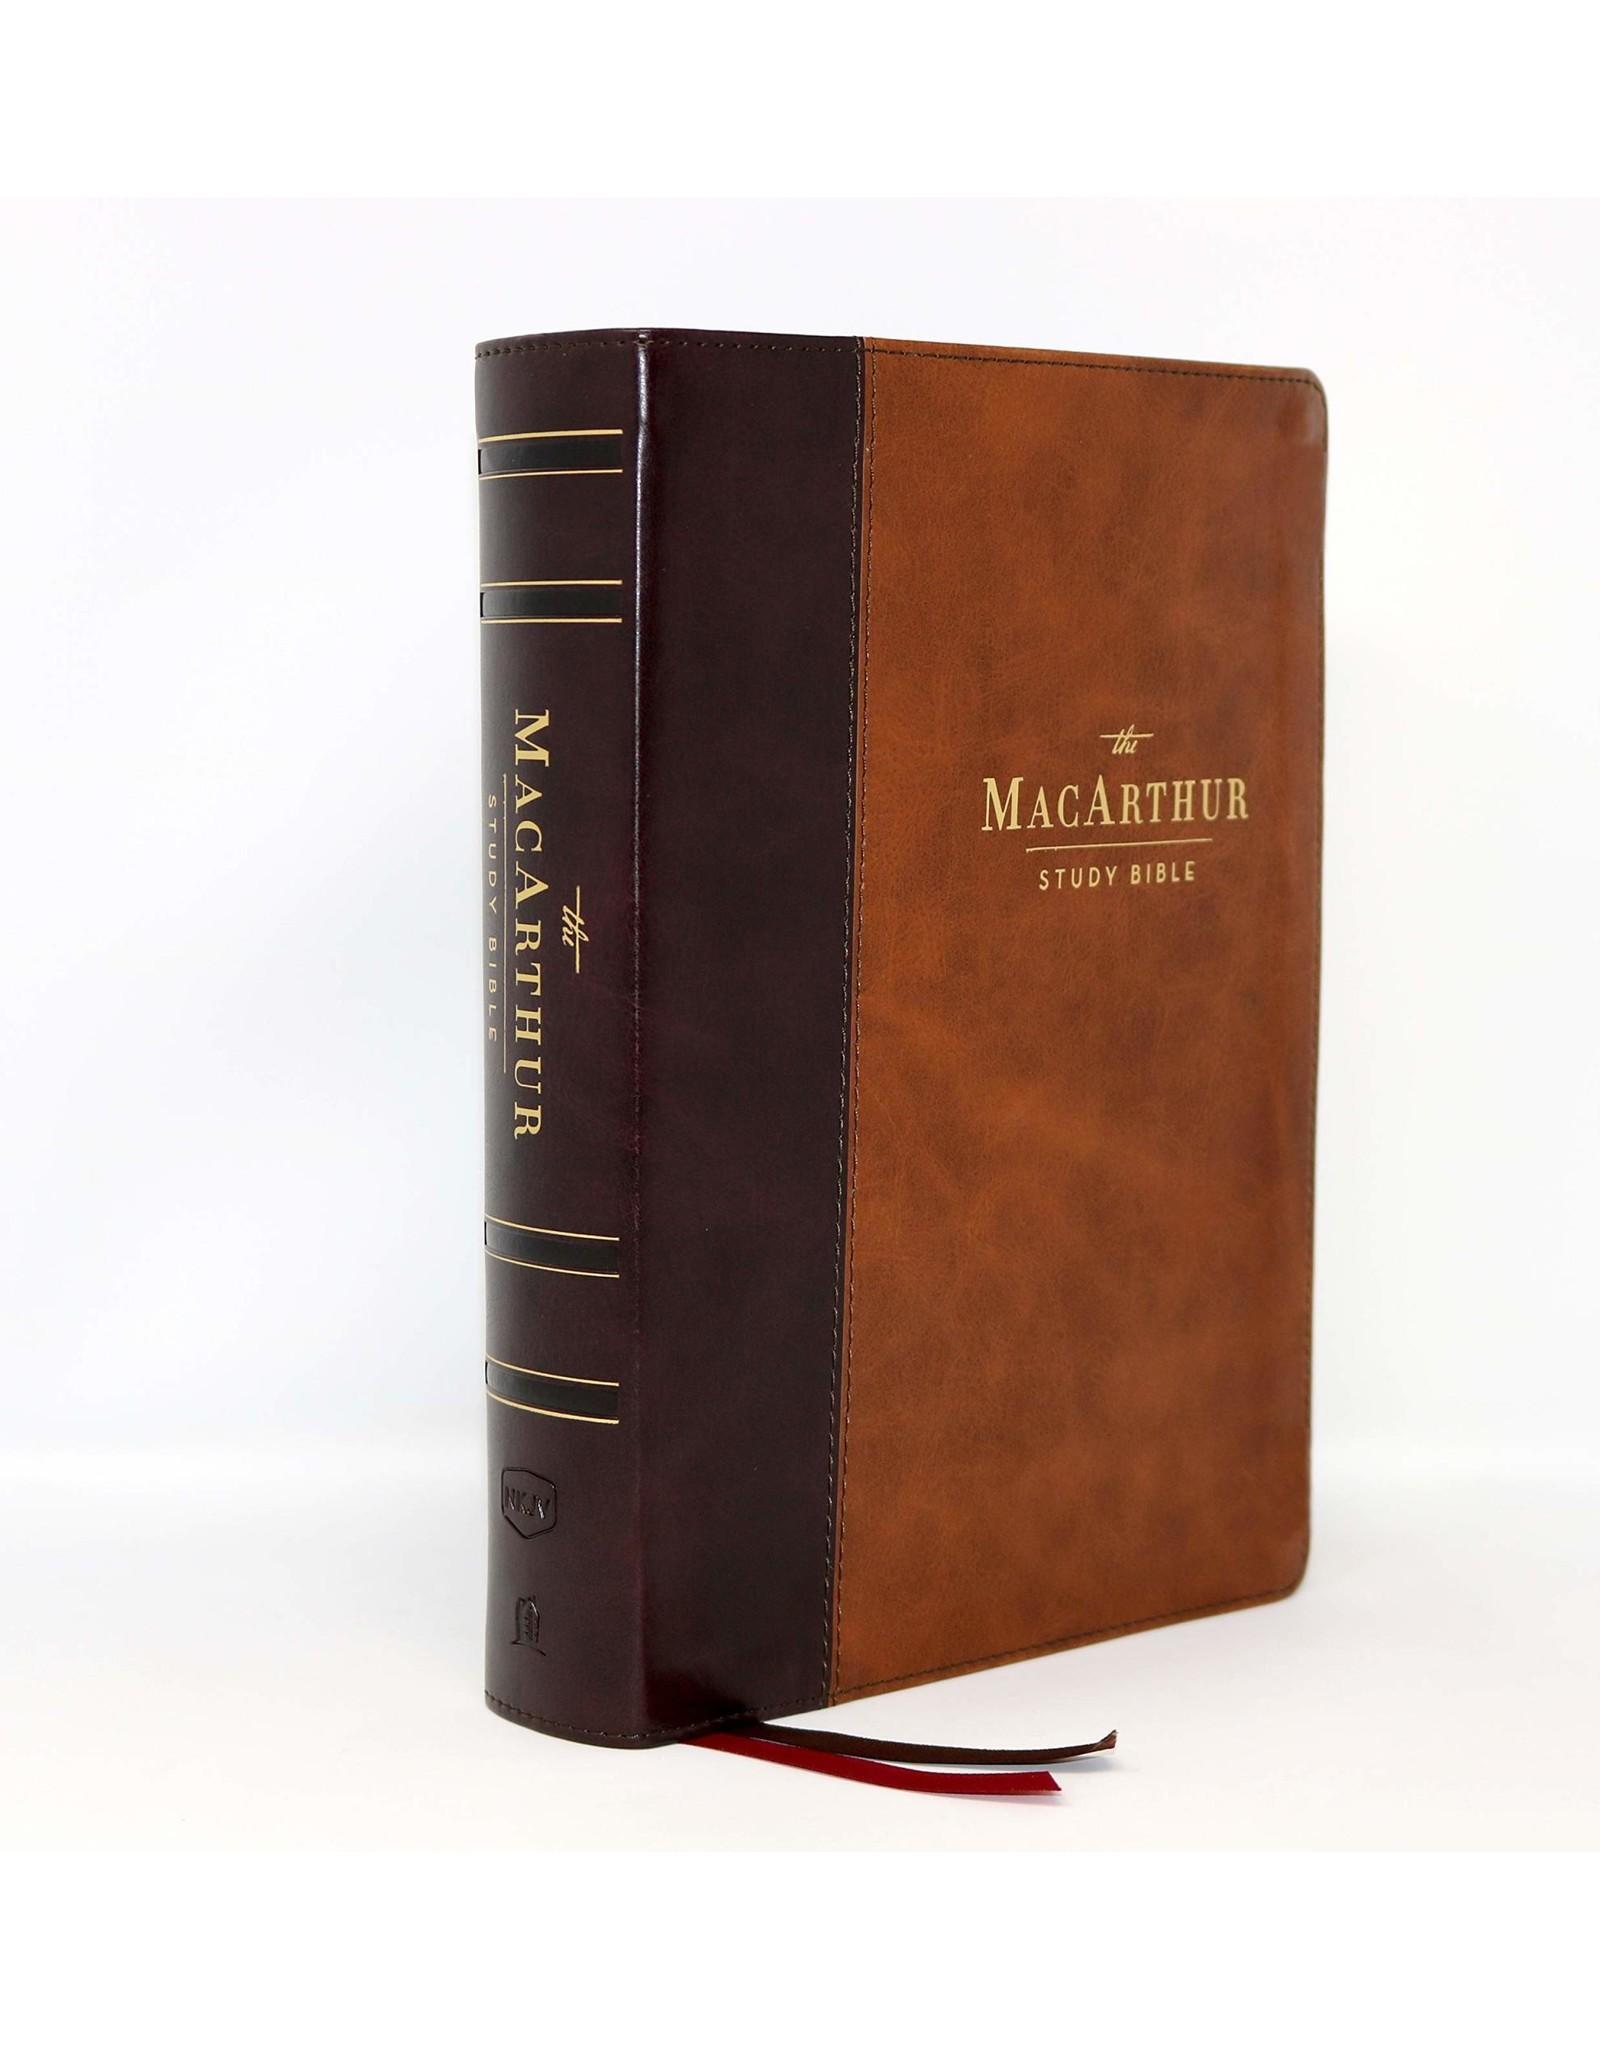 Harper Collins / Thomas Nelson / Zondervan NKJV MacArthur Study Bible, 2nd Edition, Leathersoft, Brown, Comfort Print